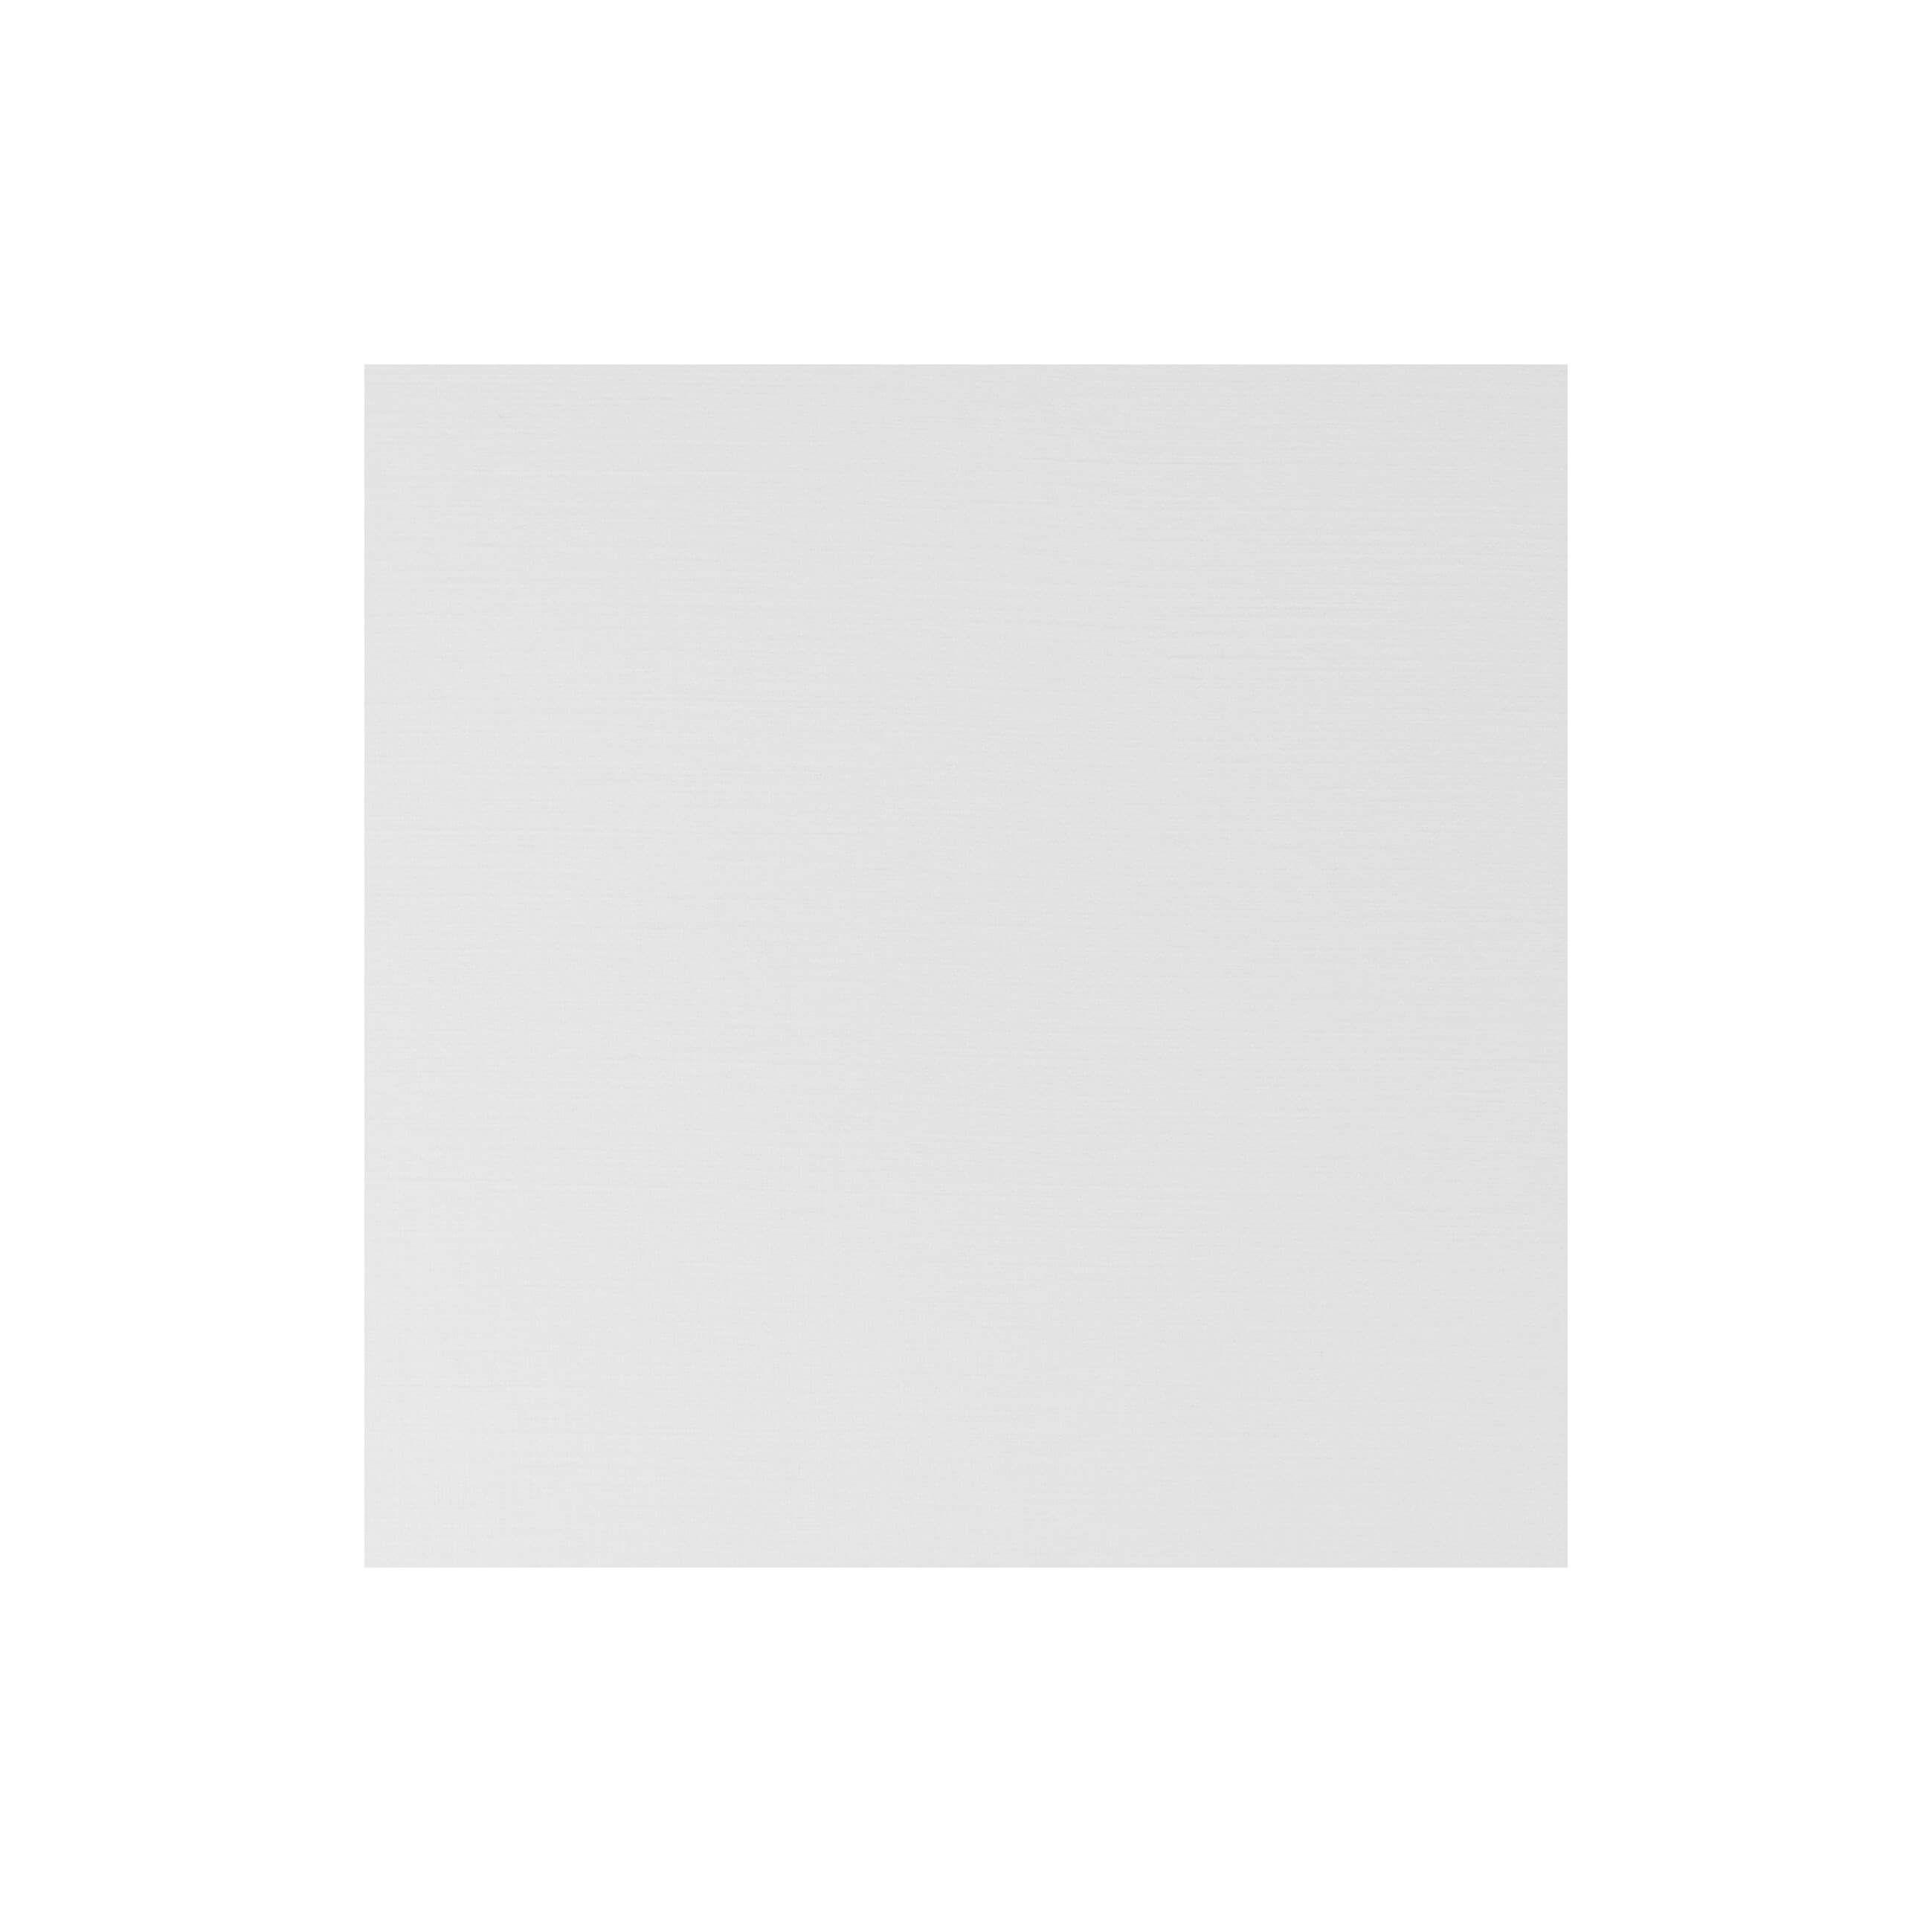 Enfolio Pocketfold (Lg Sq) Cardmount - Silkweave White